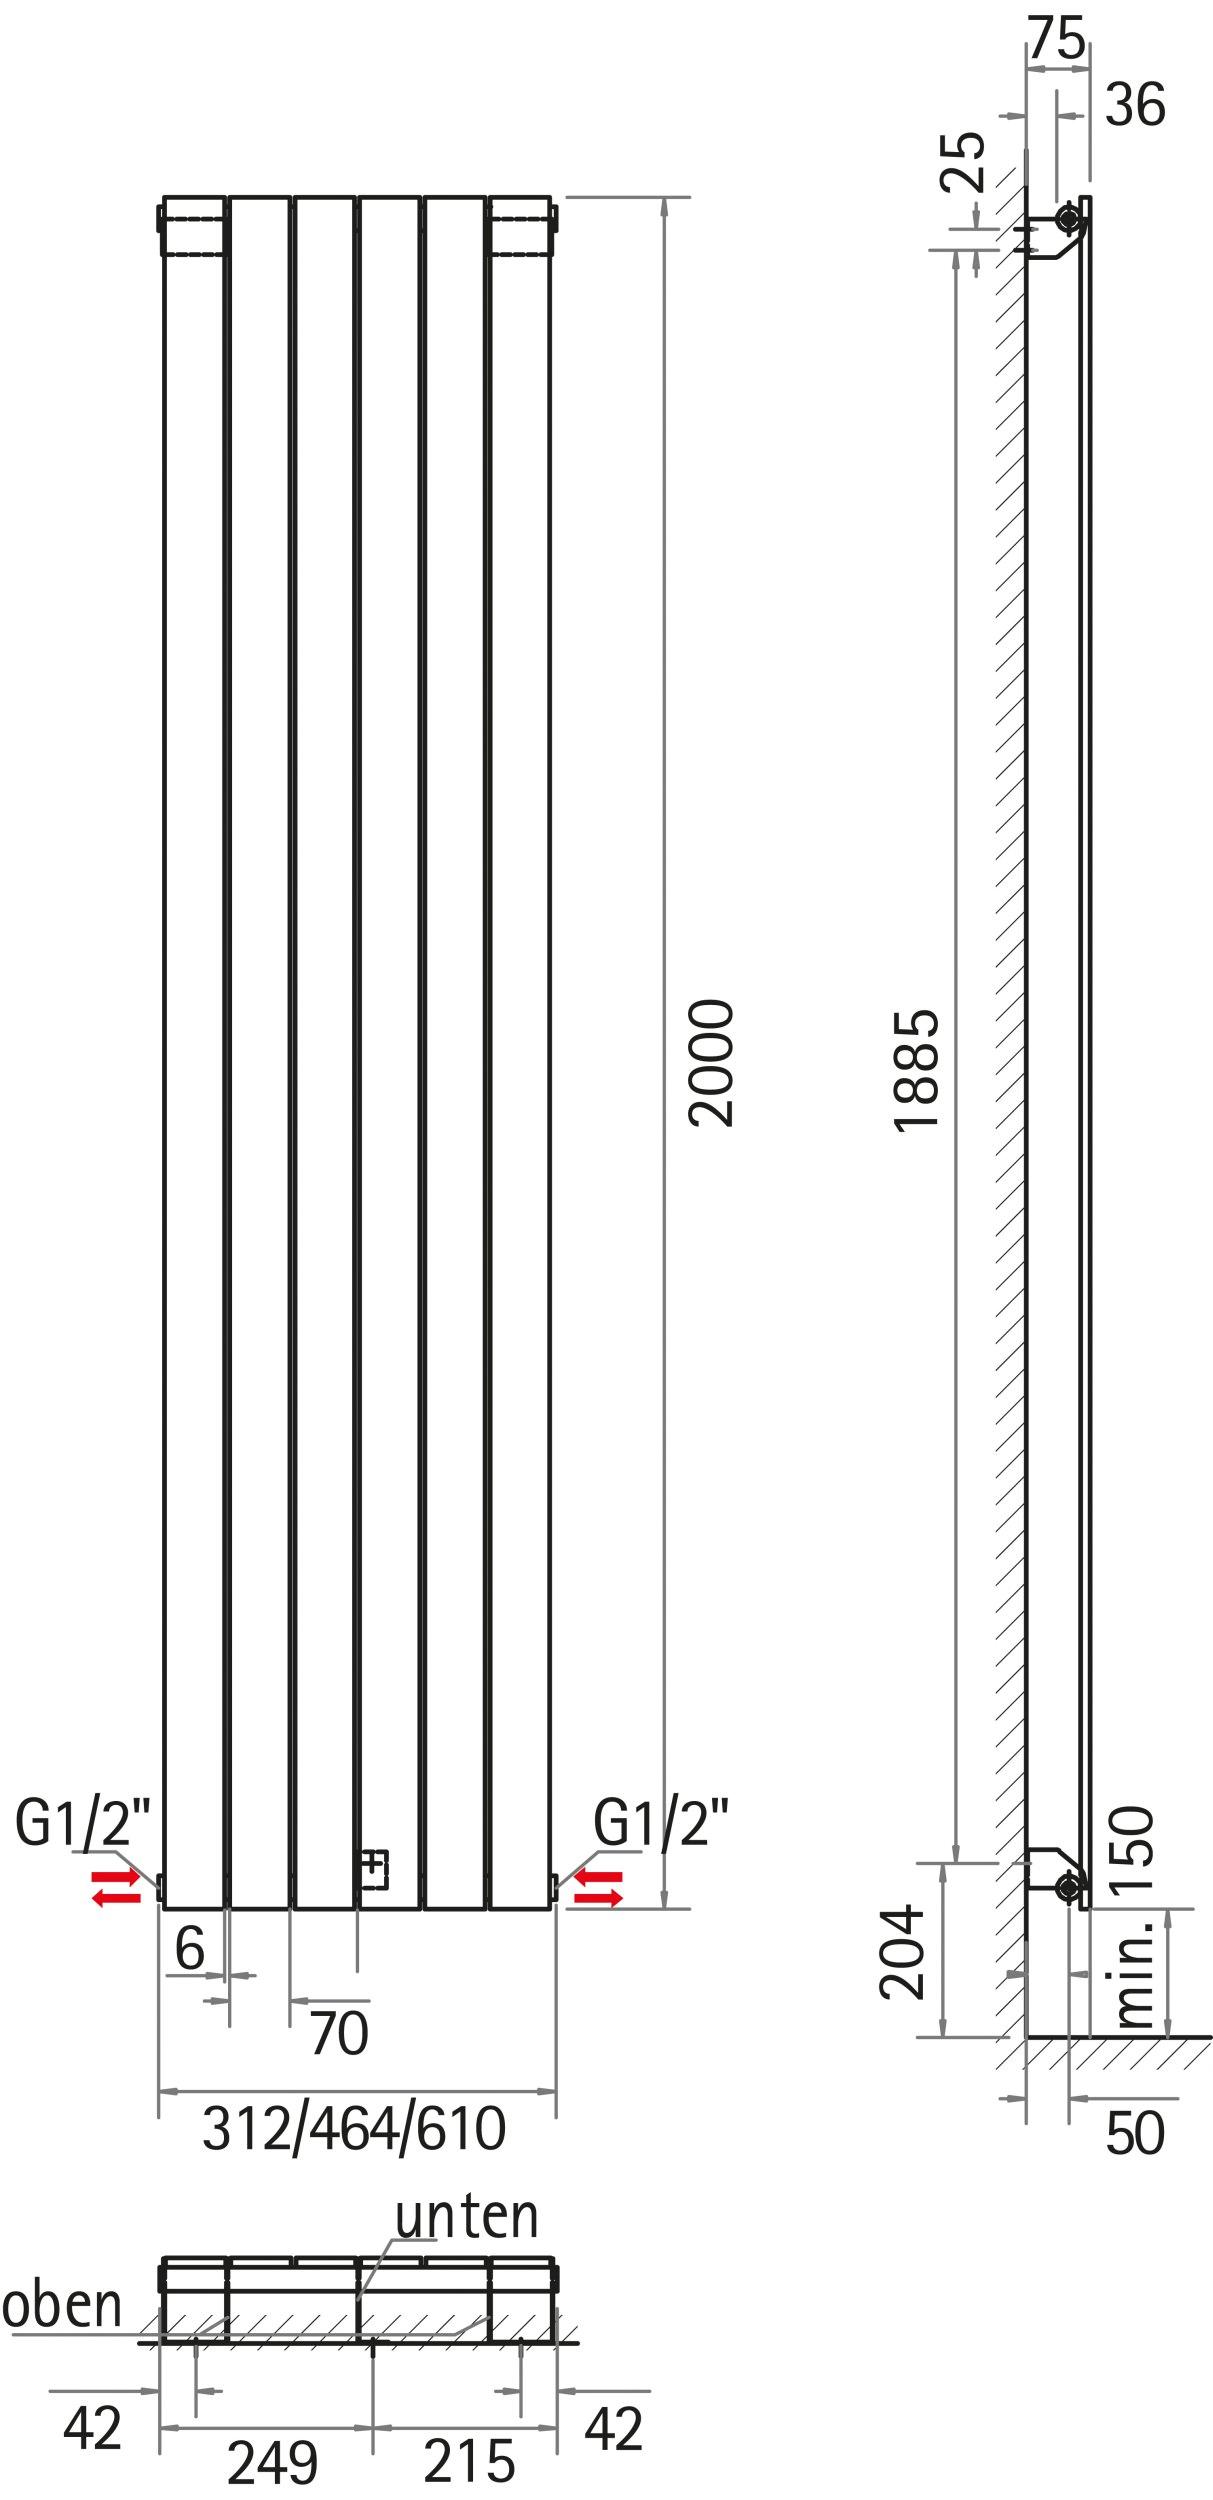 schulte aachen design heizk rper 2000mm x 464mm alpinwei mittelanschluss h3320046 m 04. Black Bedroom Furniture Sets. Home Design Ideas